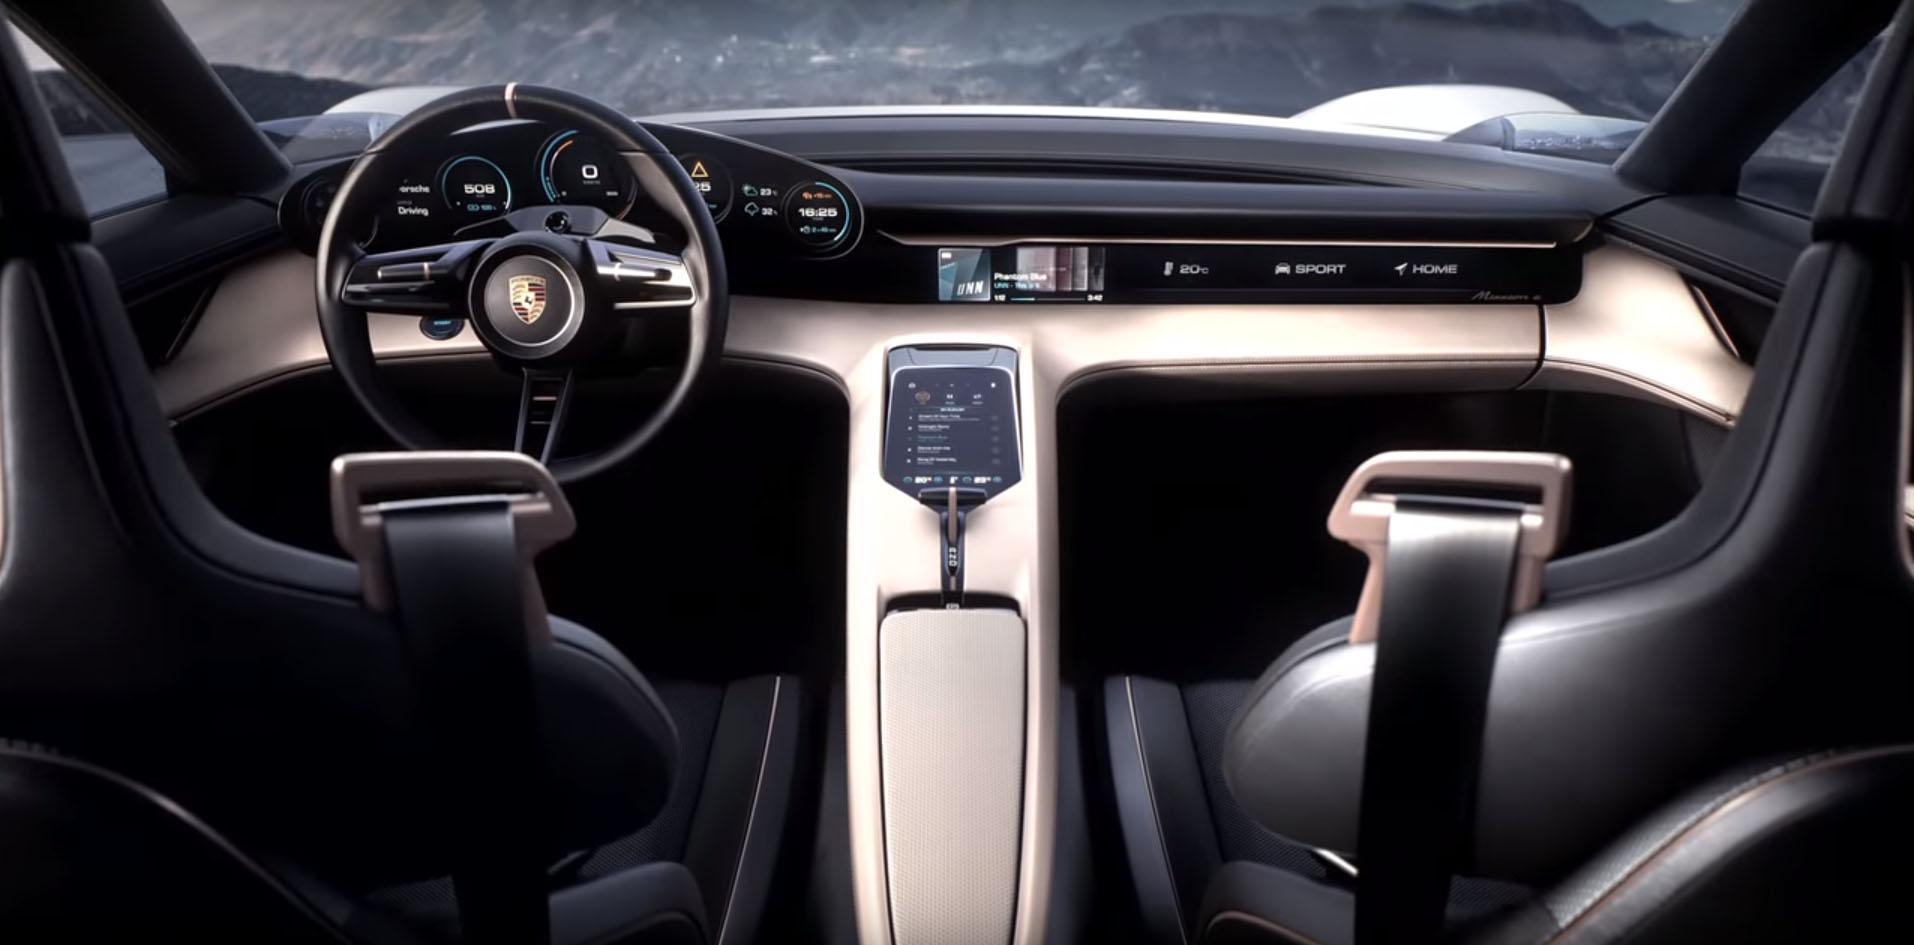 Porsche Taycan Interior Shows Prototype S Steering Wheel Ons Digital Instrument Cer